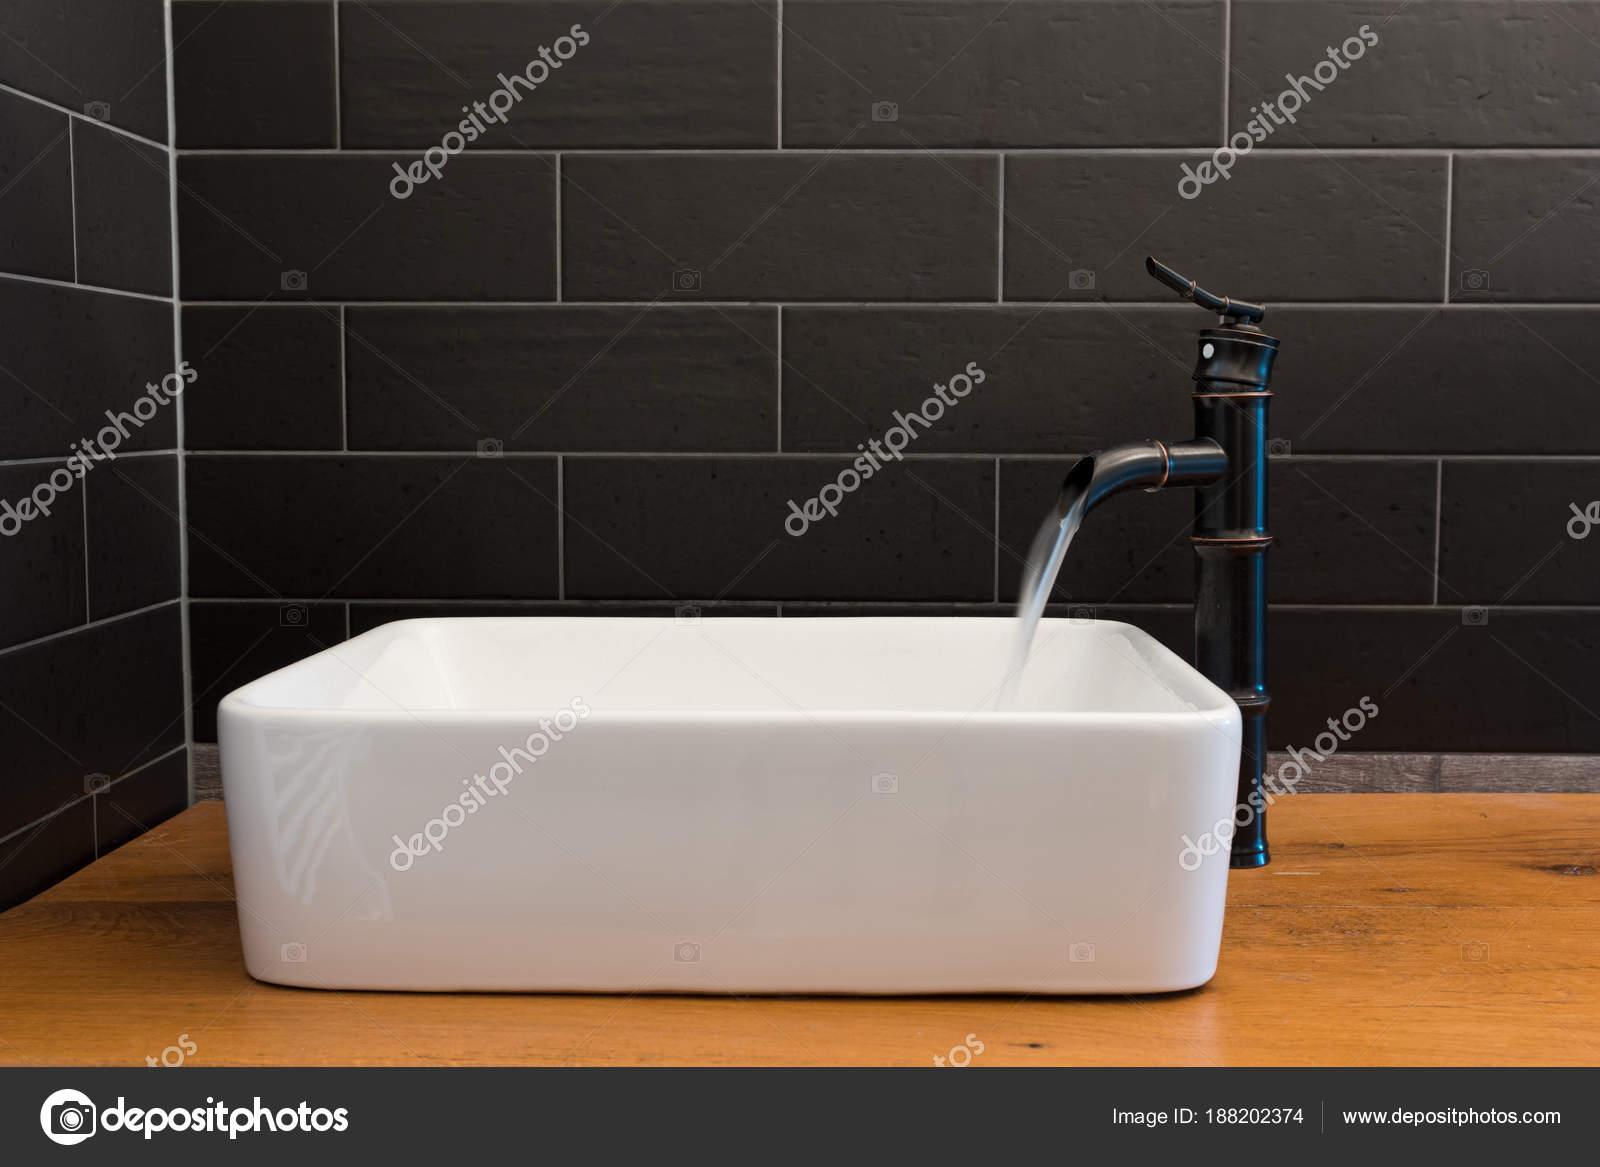 Wastafel in badkamer badkamermeubel 2 wastafels fresh dubbele